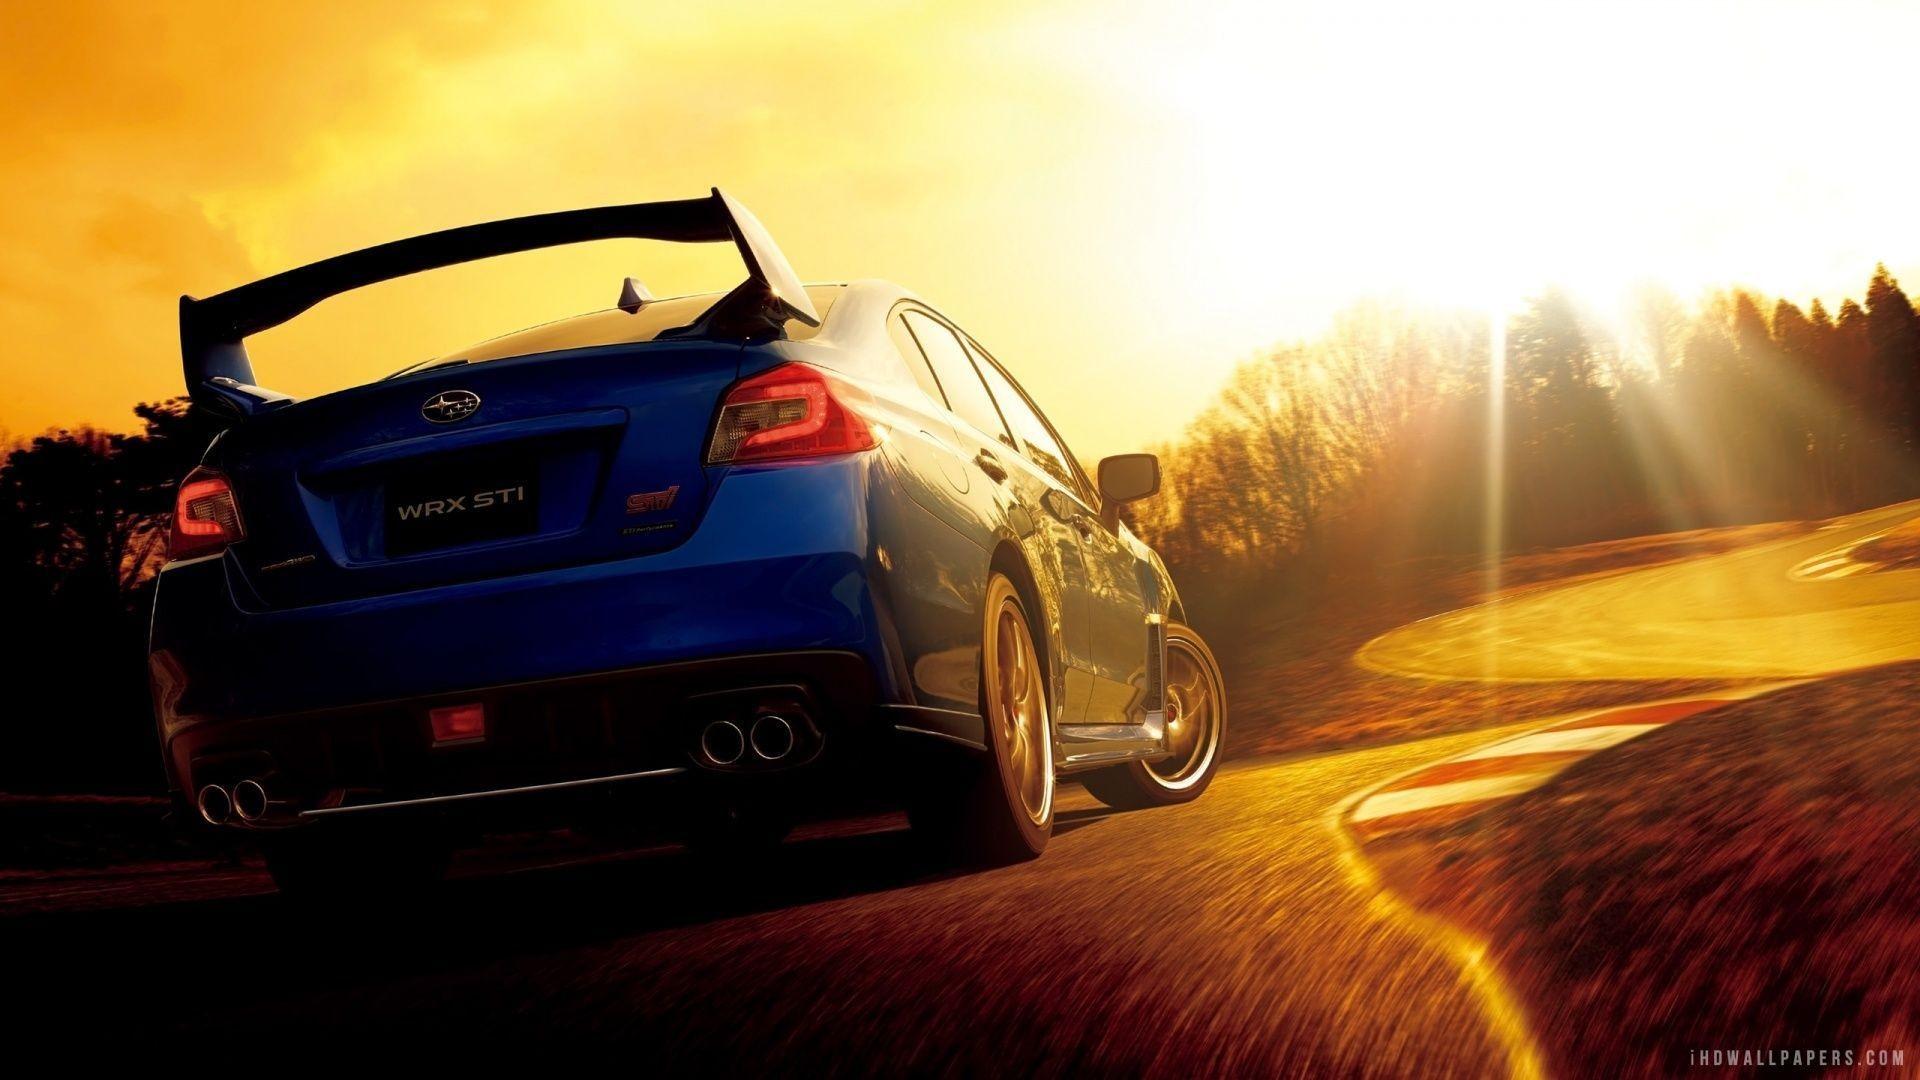 Subaru Wrx Wallpaper iPhone – image #419